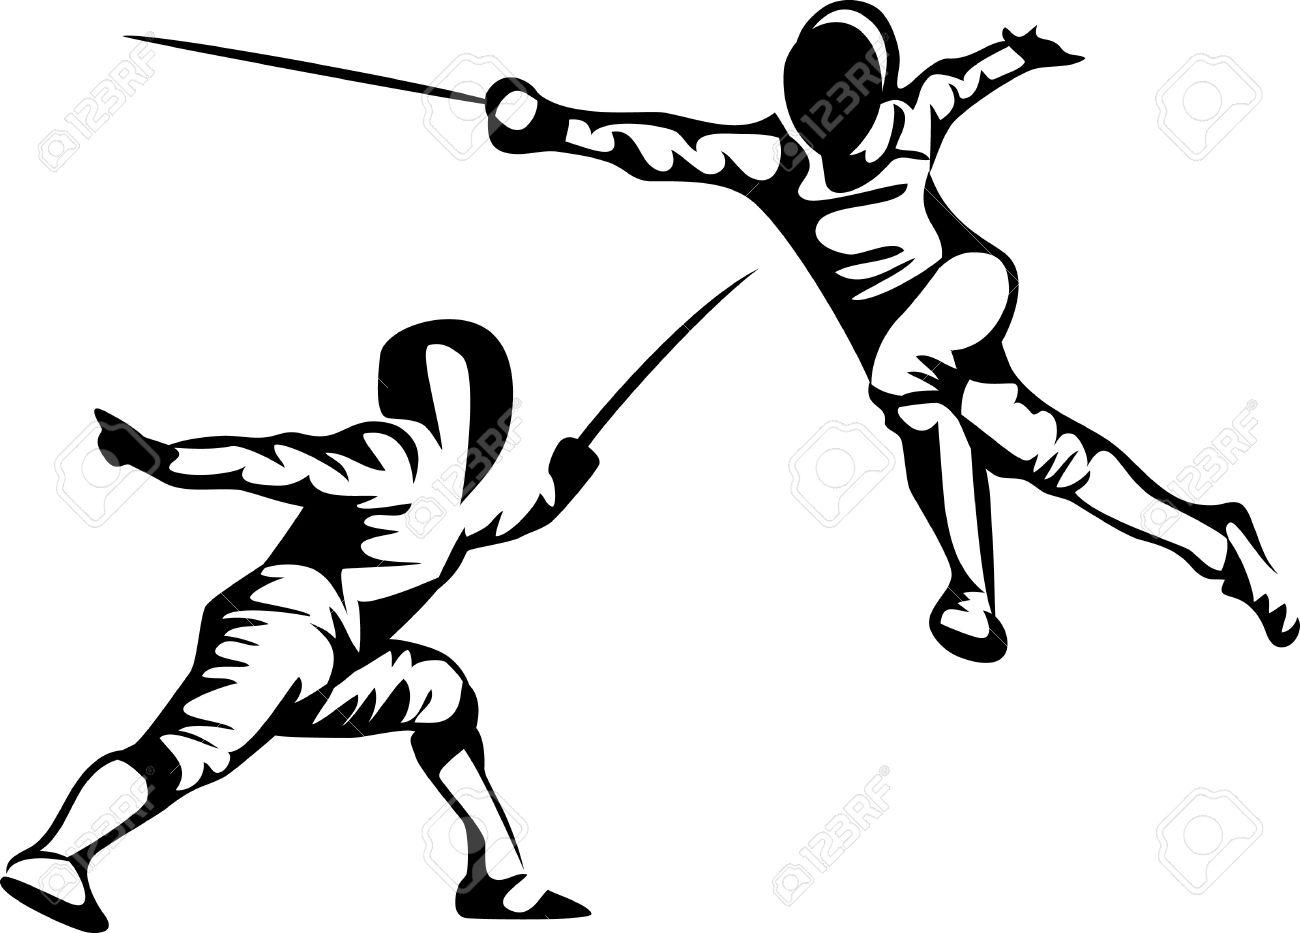 Fencer Clipart